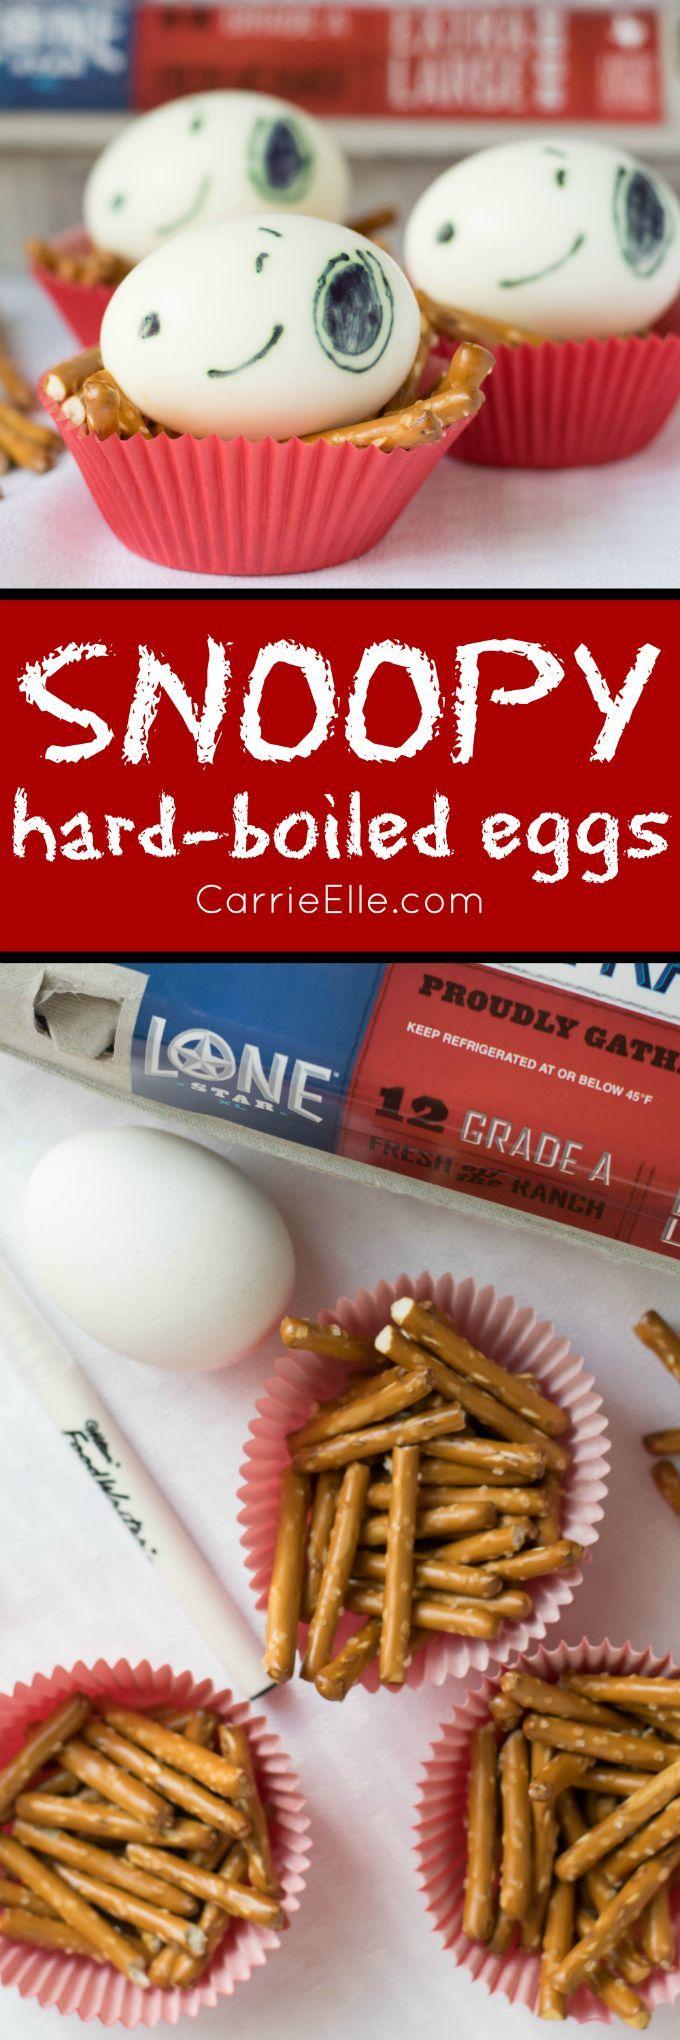 Snoopy Hard-Boiled Eggs